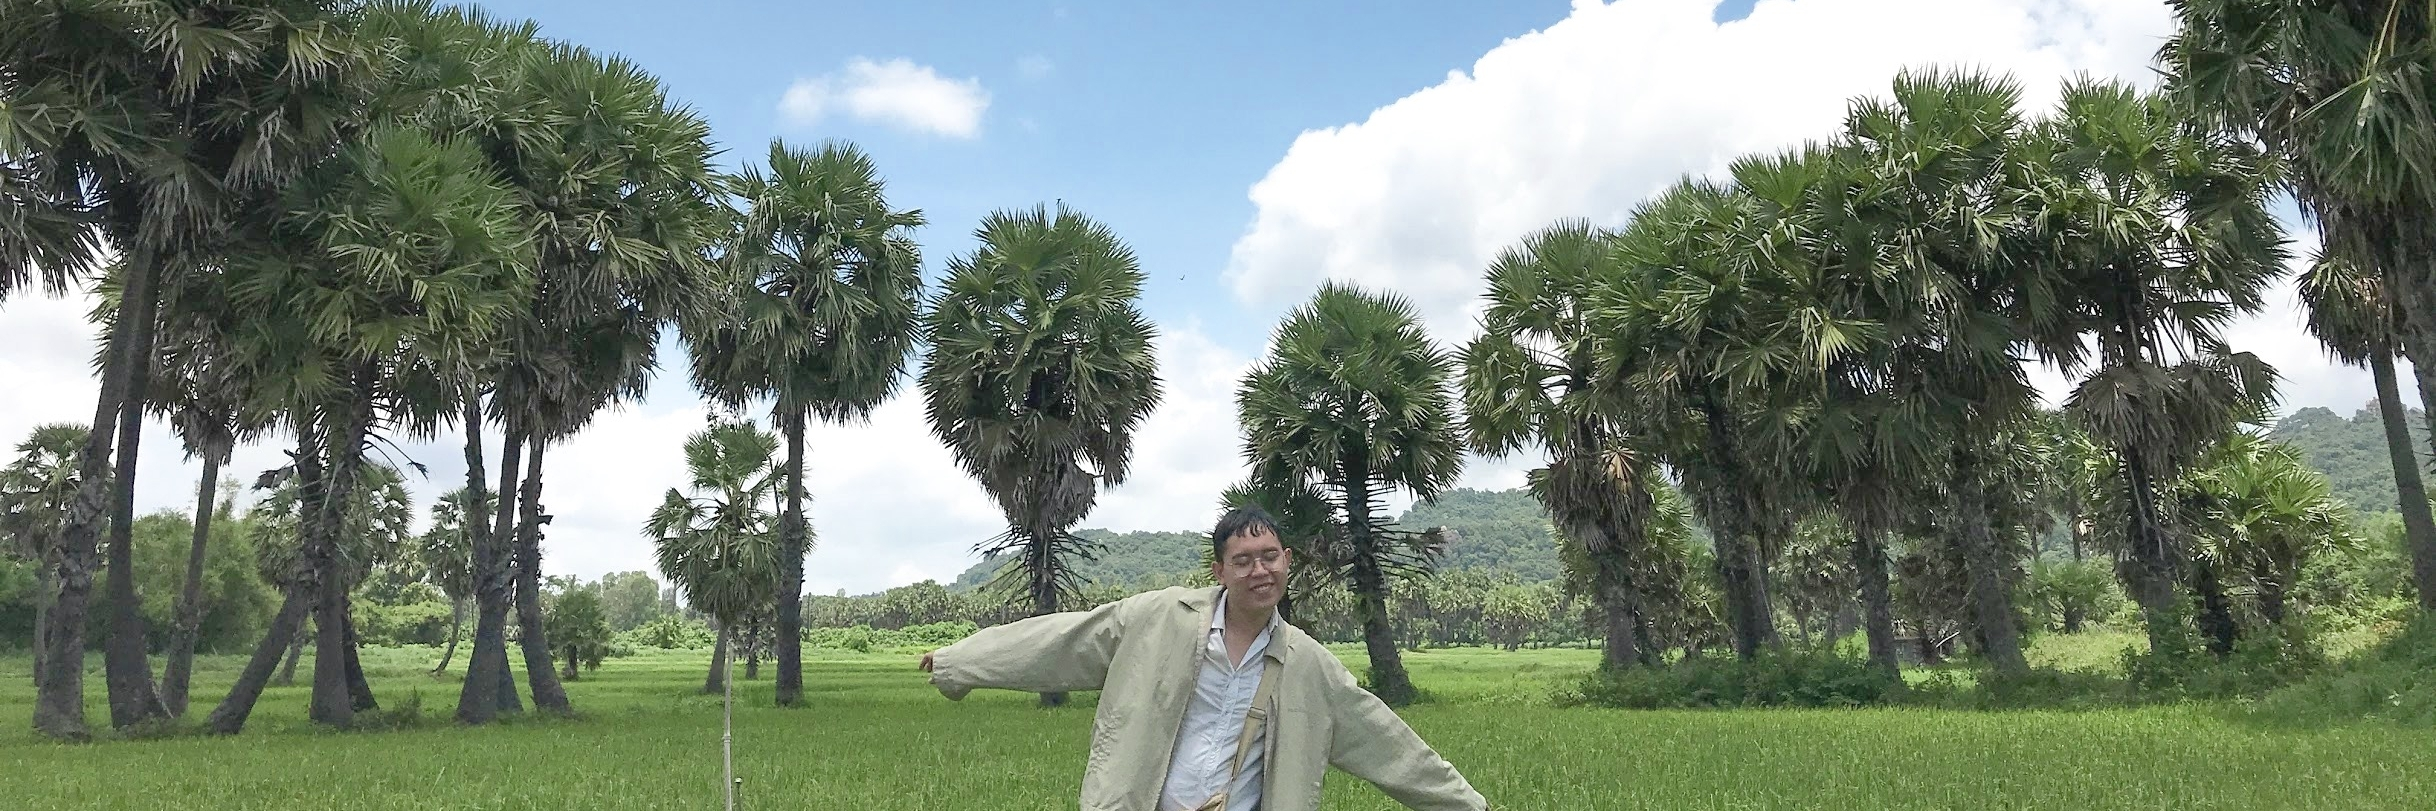 https://gody.vn/blog/lehuy24693023/post/chuyen-ve-an-giang-va-nhung-canh-dong-ta-pa-4688